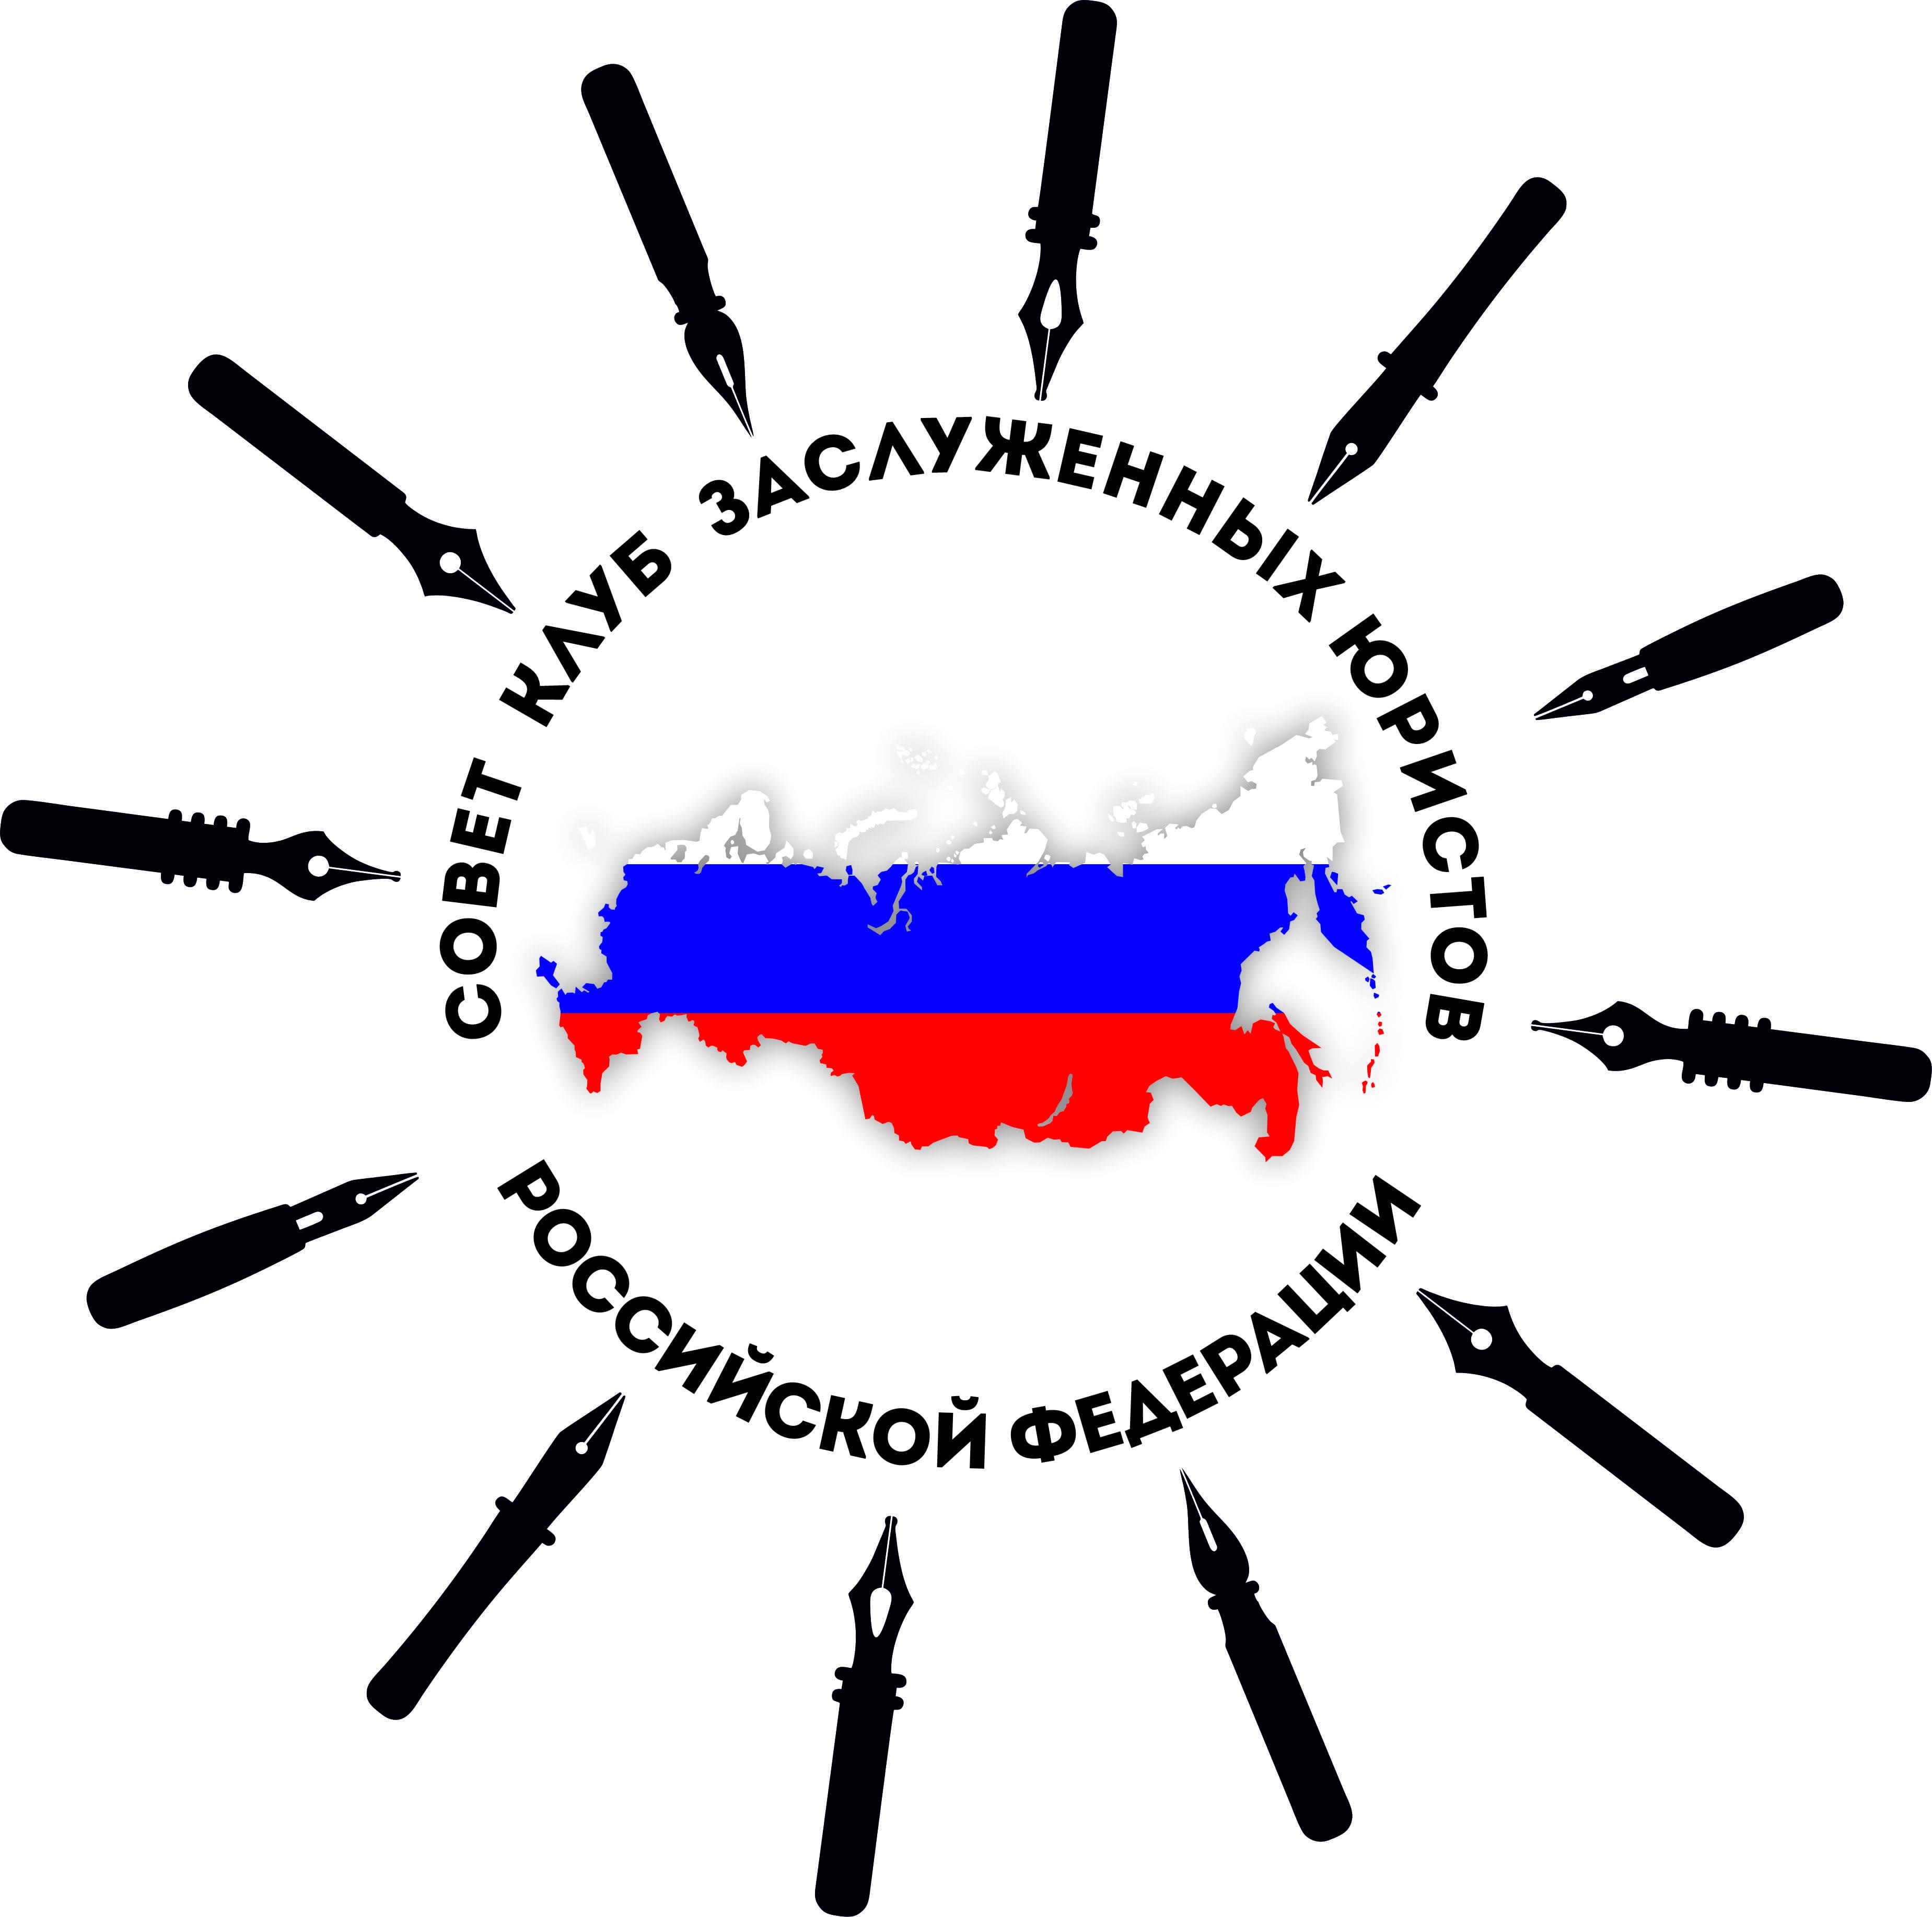 Разработка логотипа Совета (Клуба) заслуженных юристов Российской Федерации фото f_8225e41812cc91e3.jpg